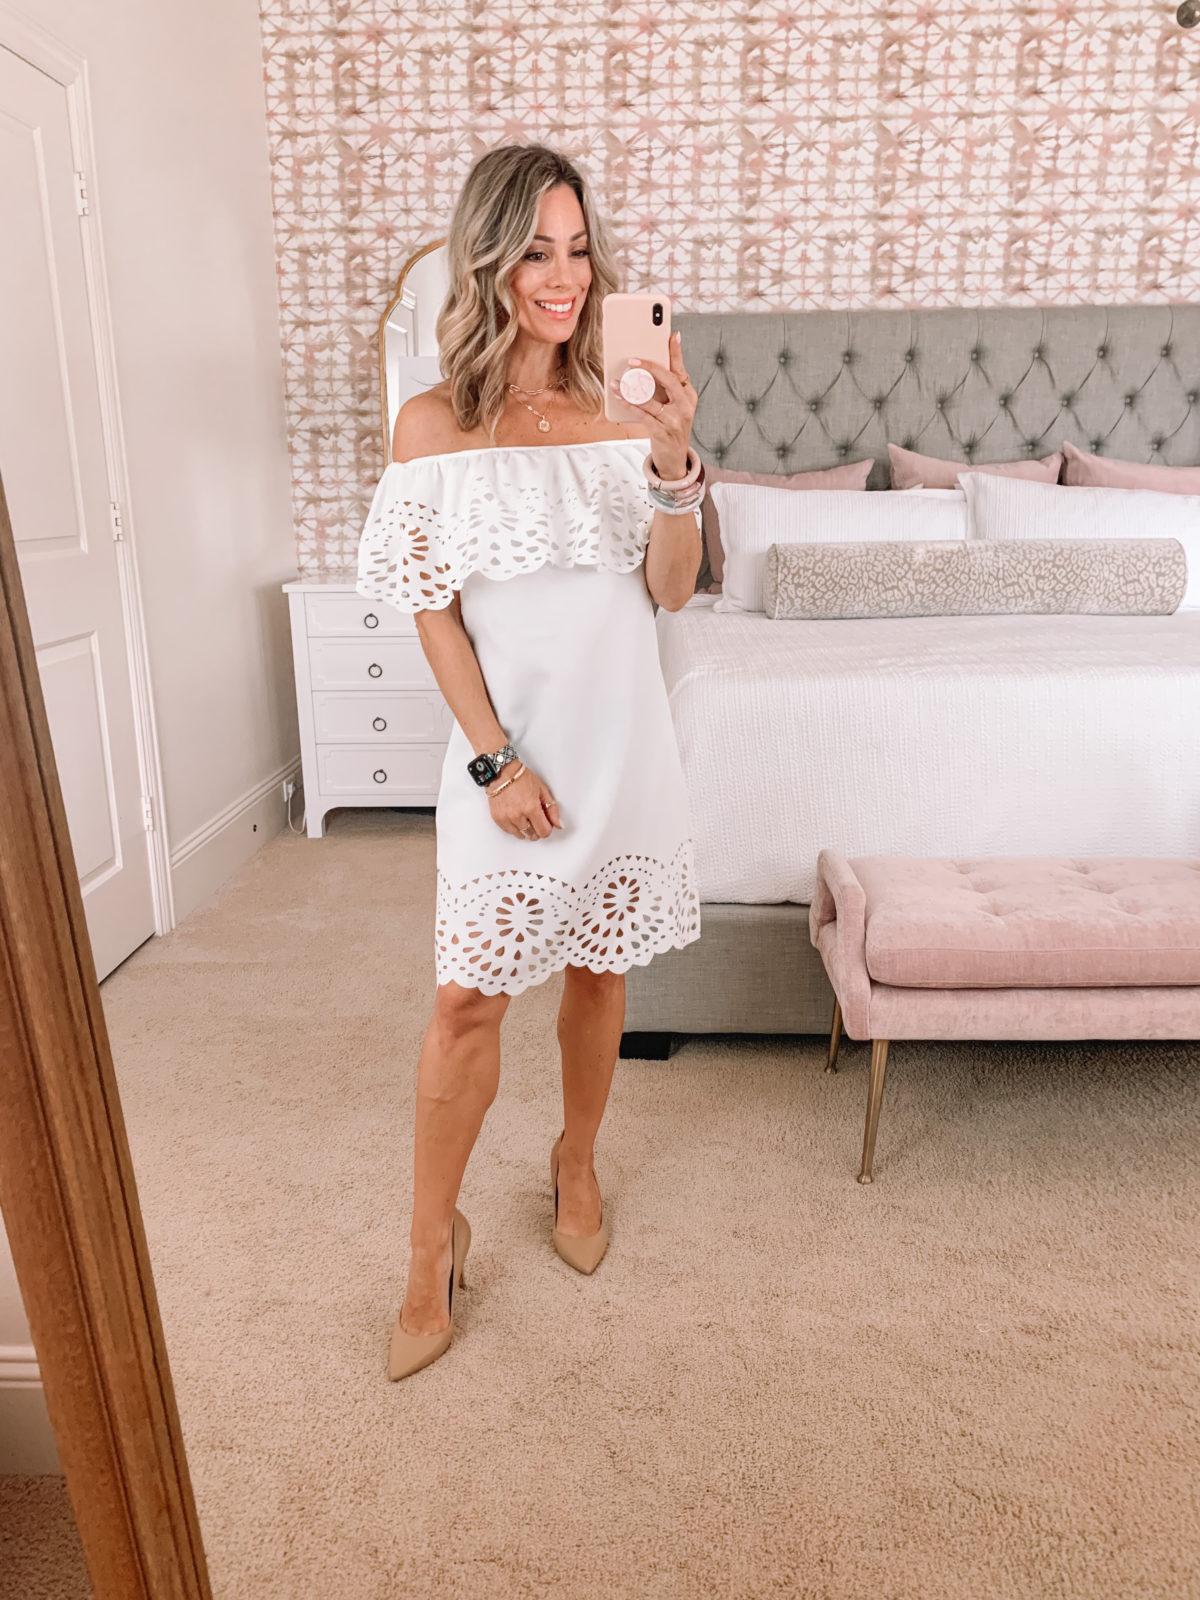 Amazon Fashion Faves, White Dress